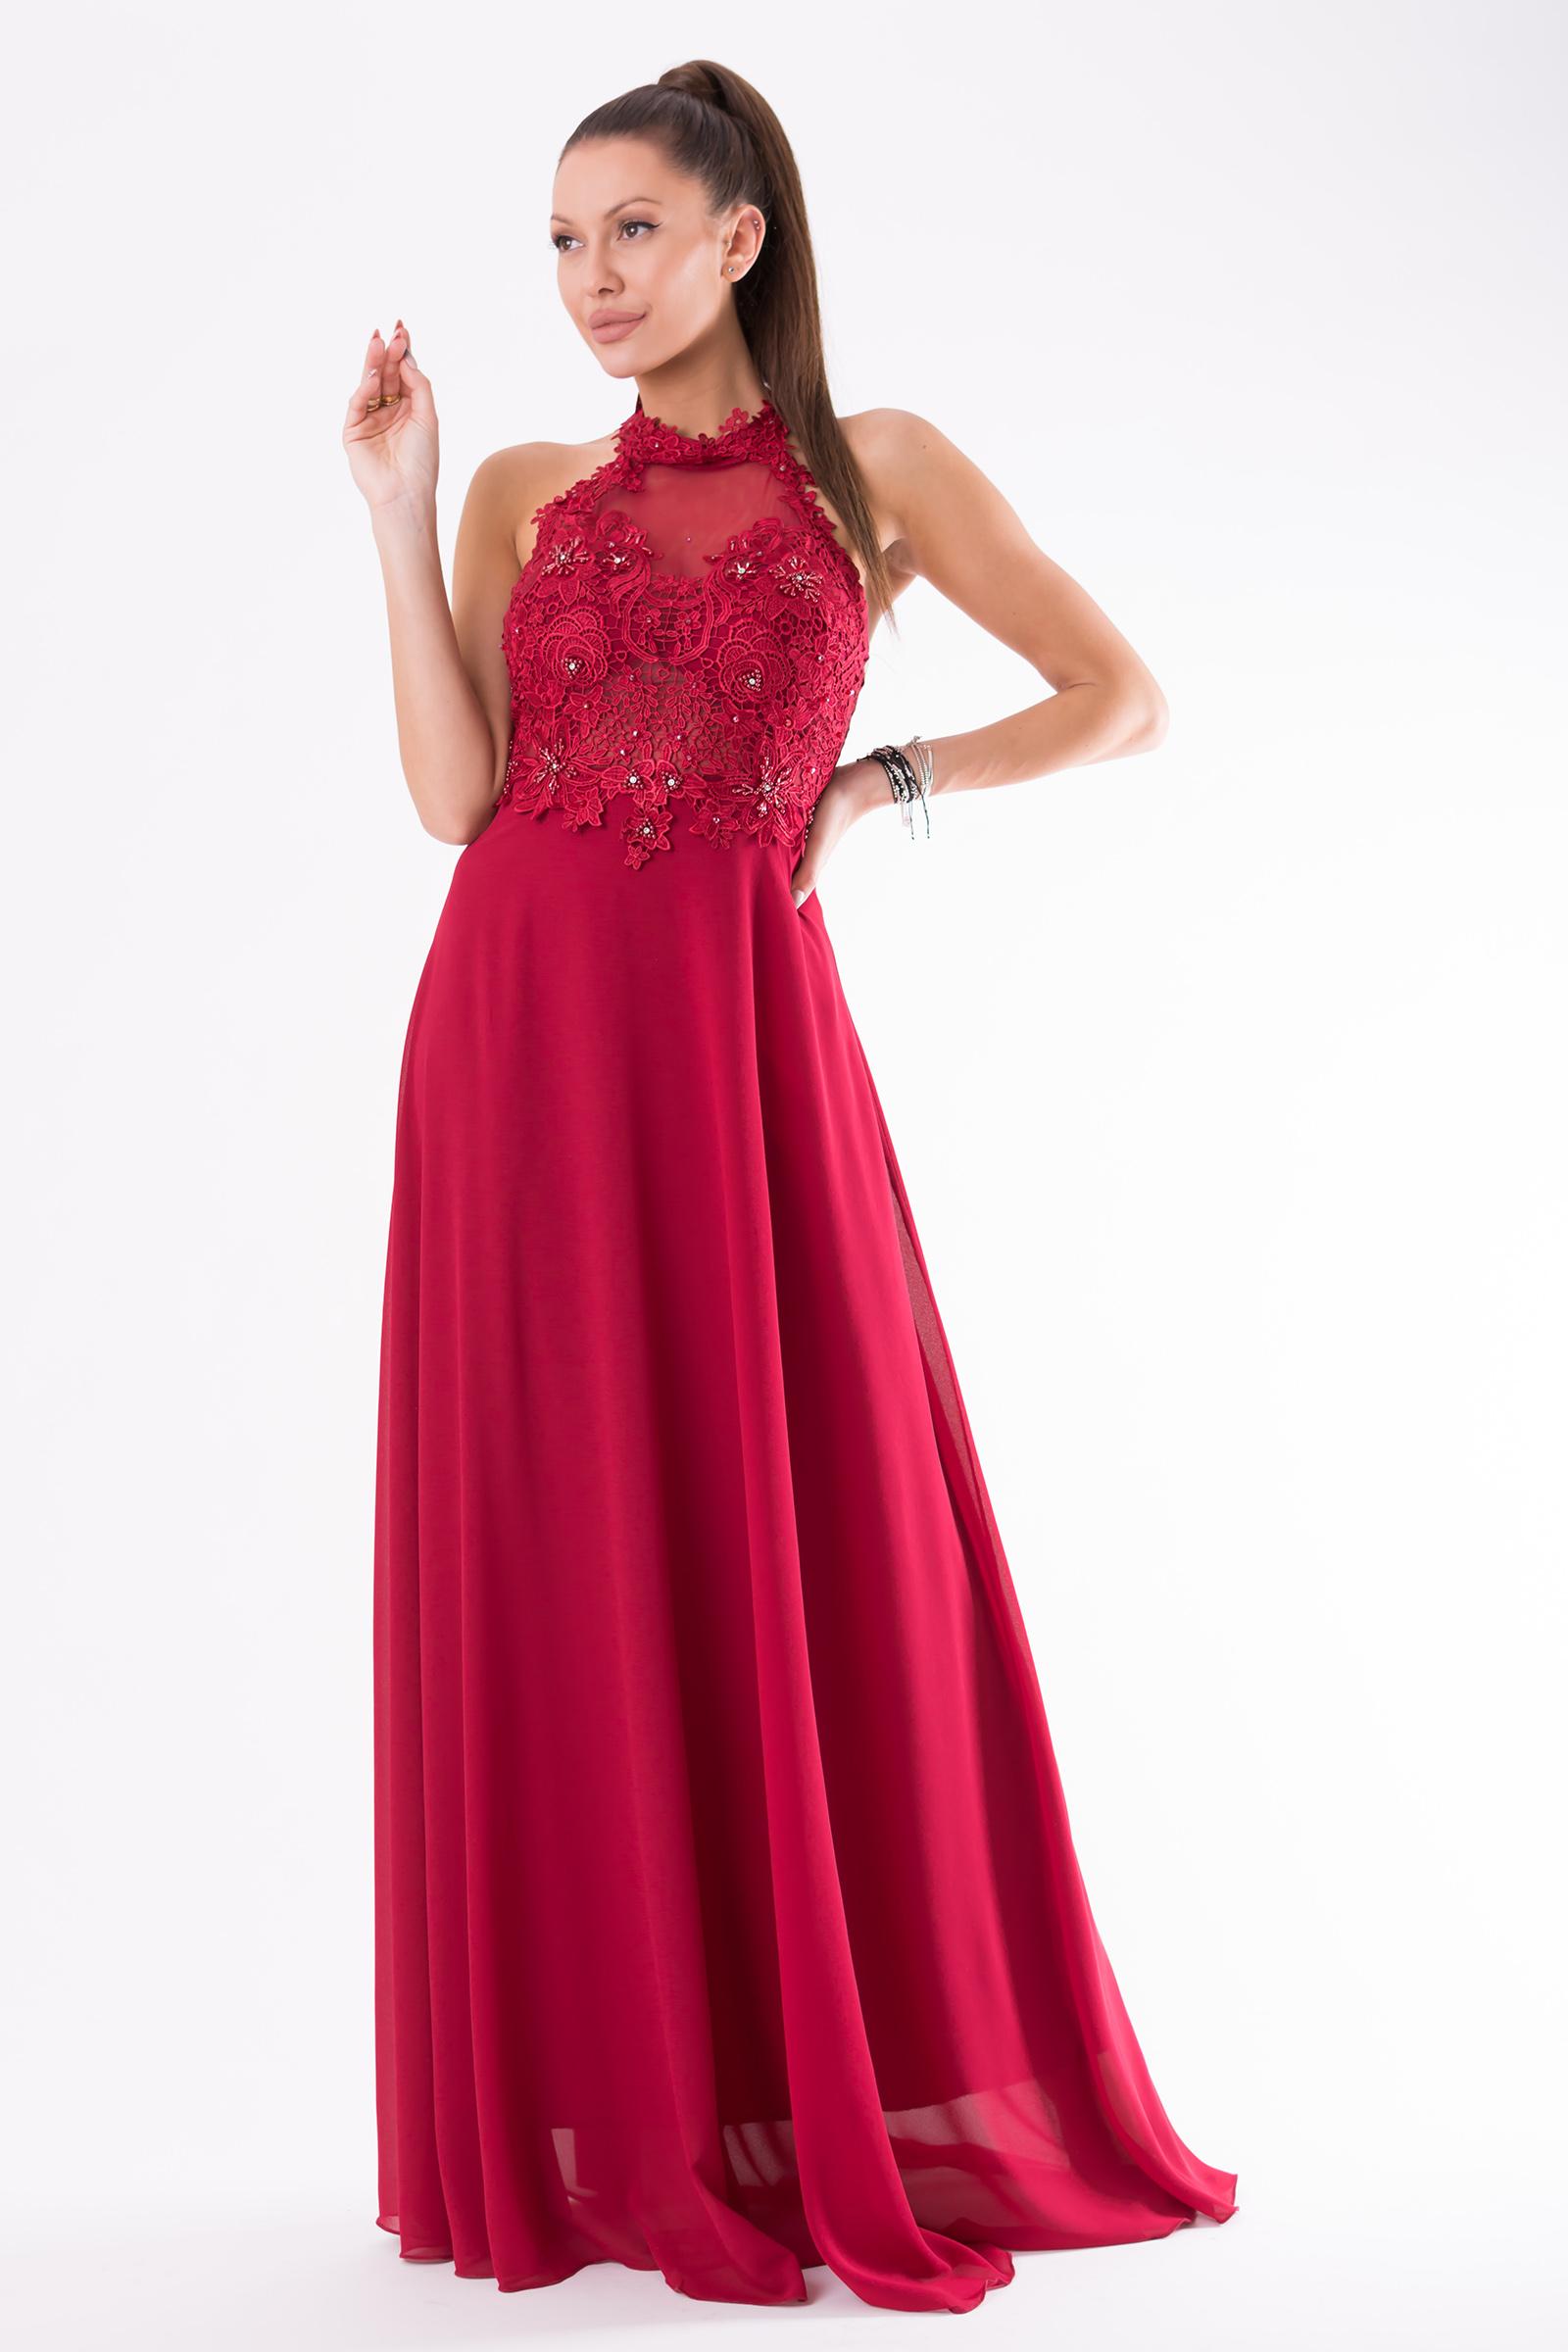 EVA&LOLA  DRESS RED 54003-3